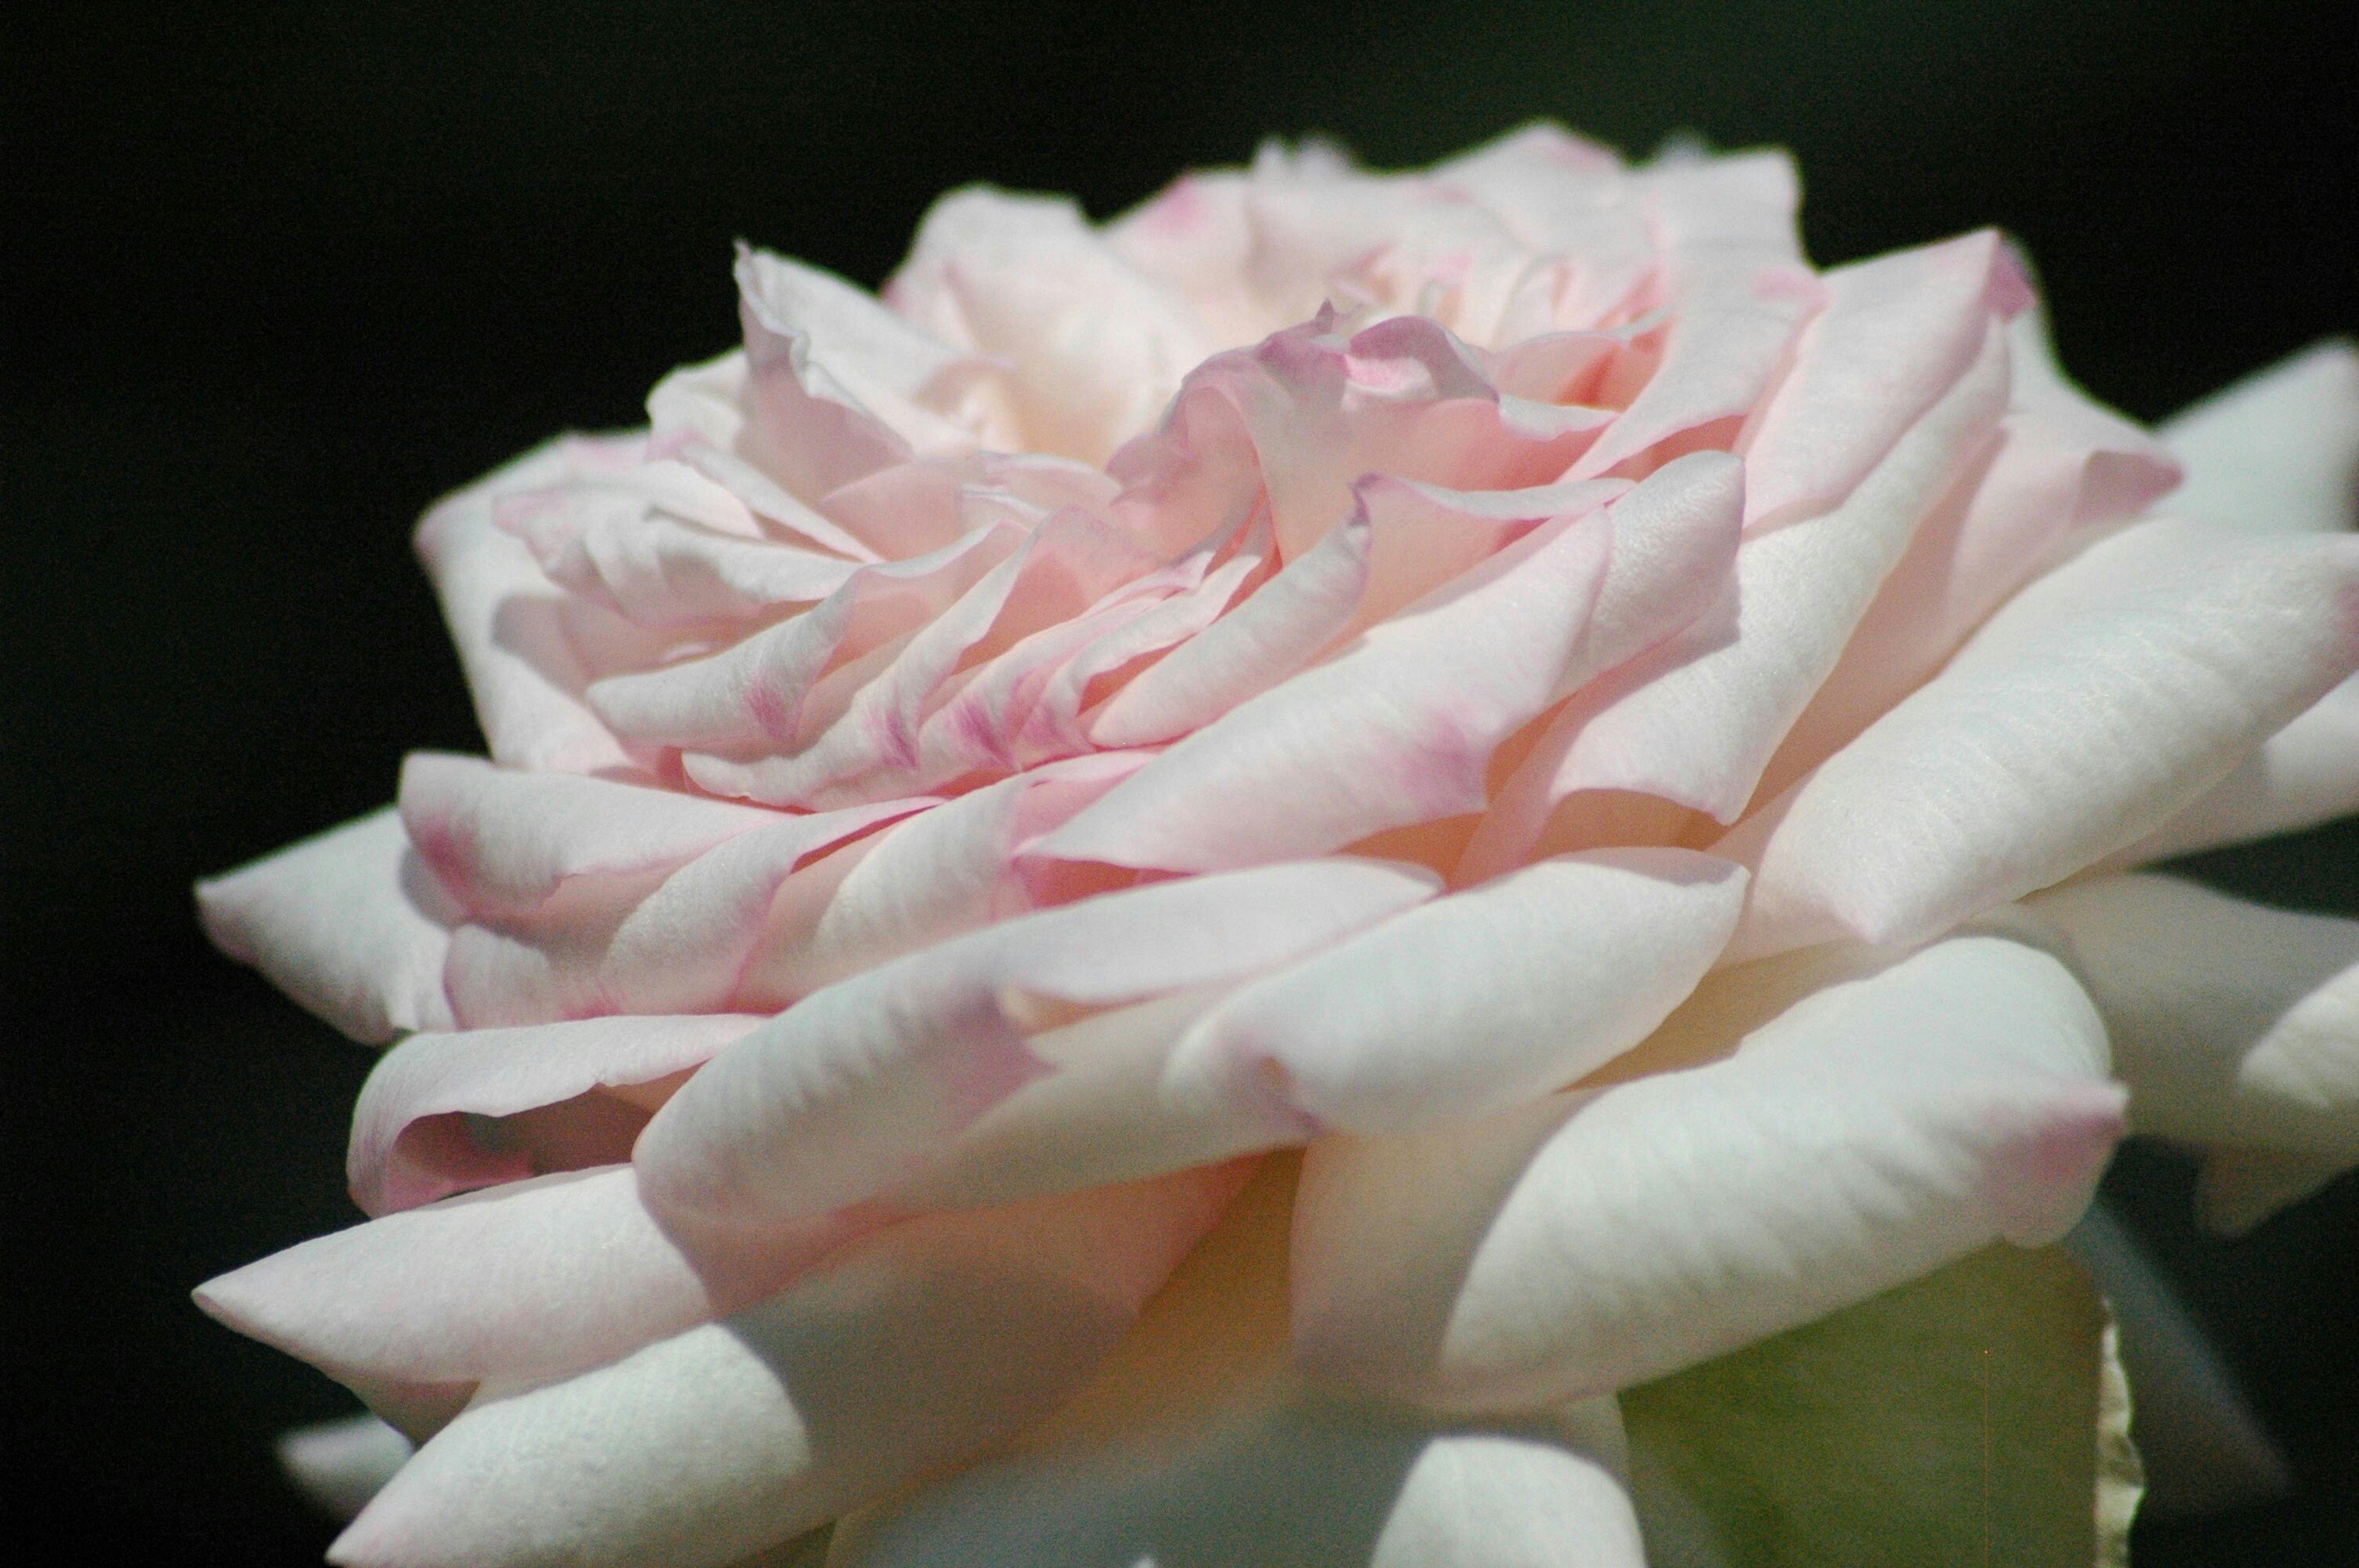 flower, petal, flower head, fragility, freshness, beauty in nature, close-up, studio shot, growth, black background, single flower, nature, rose - flower, pink color, blooming, plant, no people, natural pattern, rose, bloom